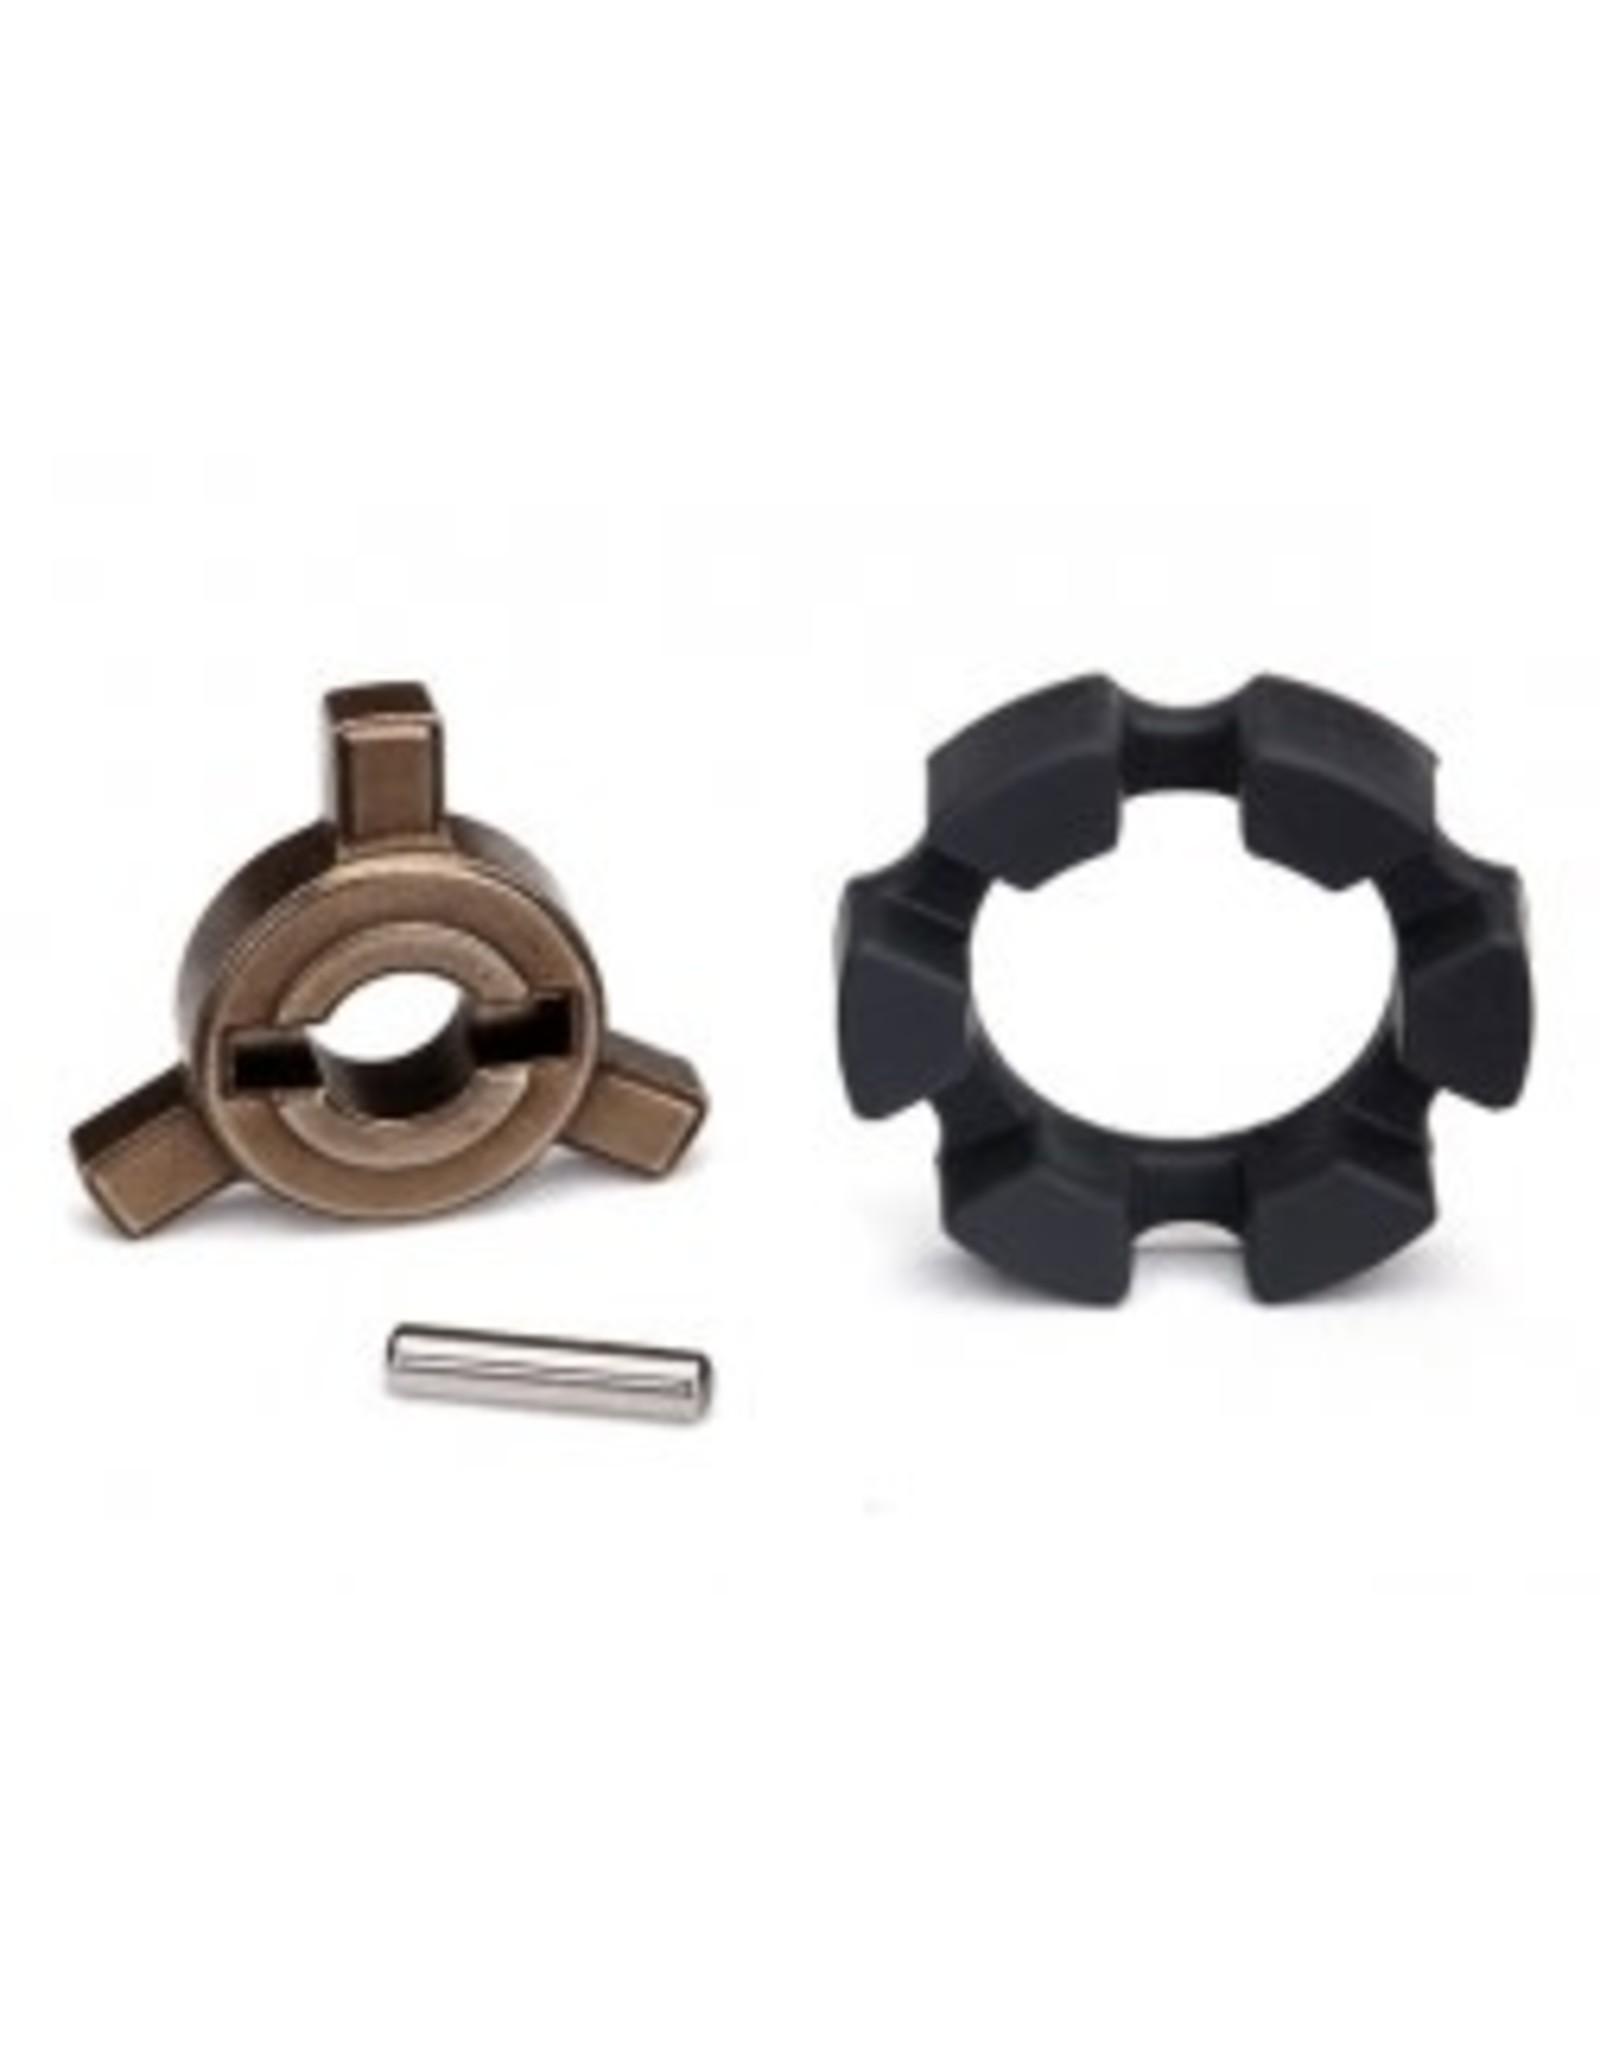 Traxxas [Cush drive key/ pin/ elastomer damper] Cush drive key/ pin/ elastomer dampe